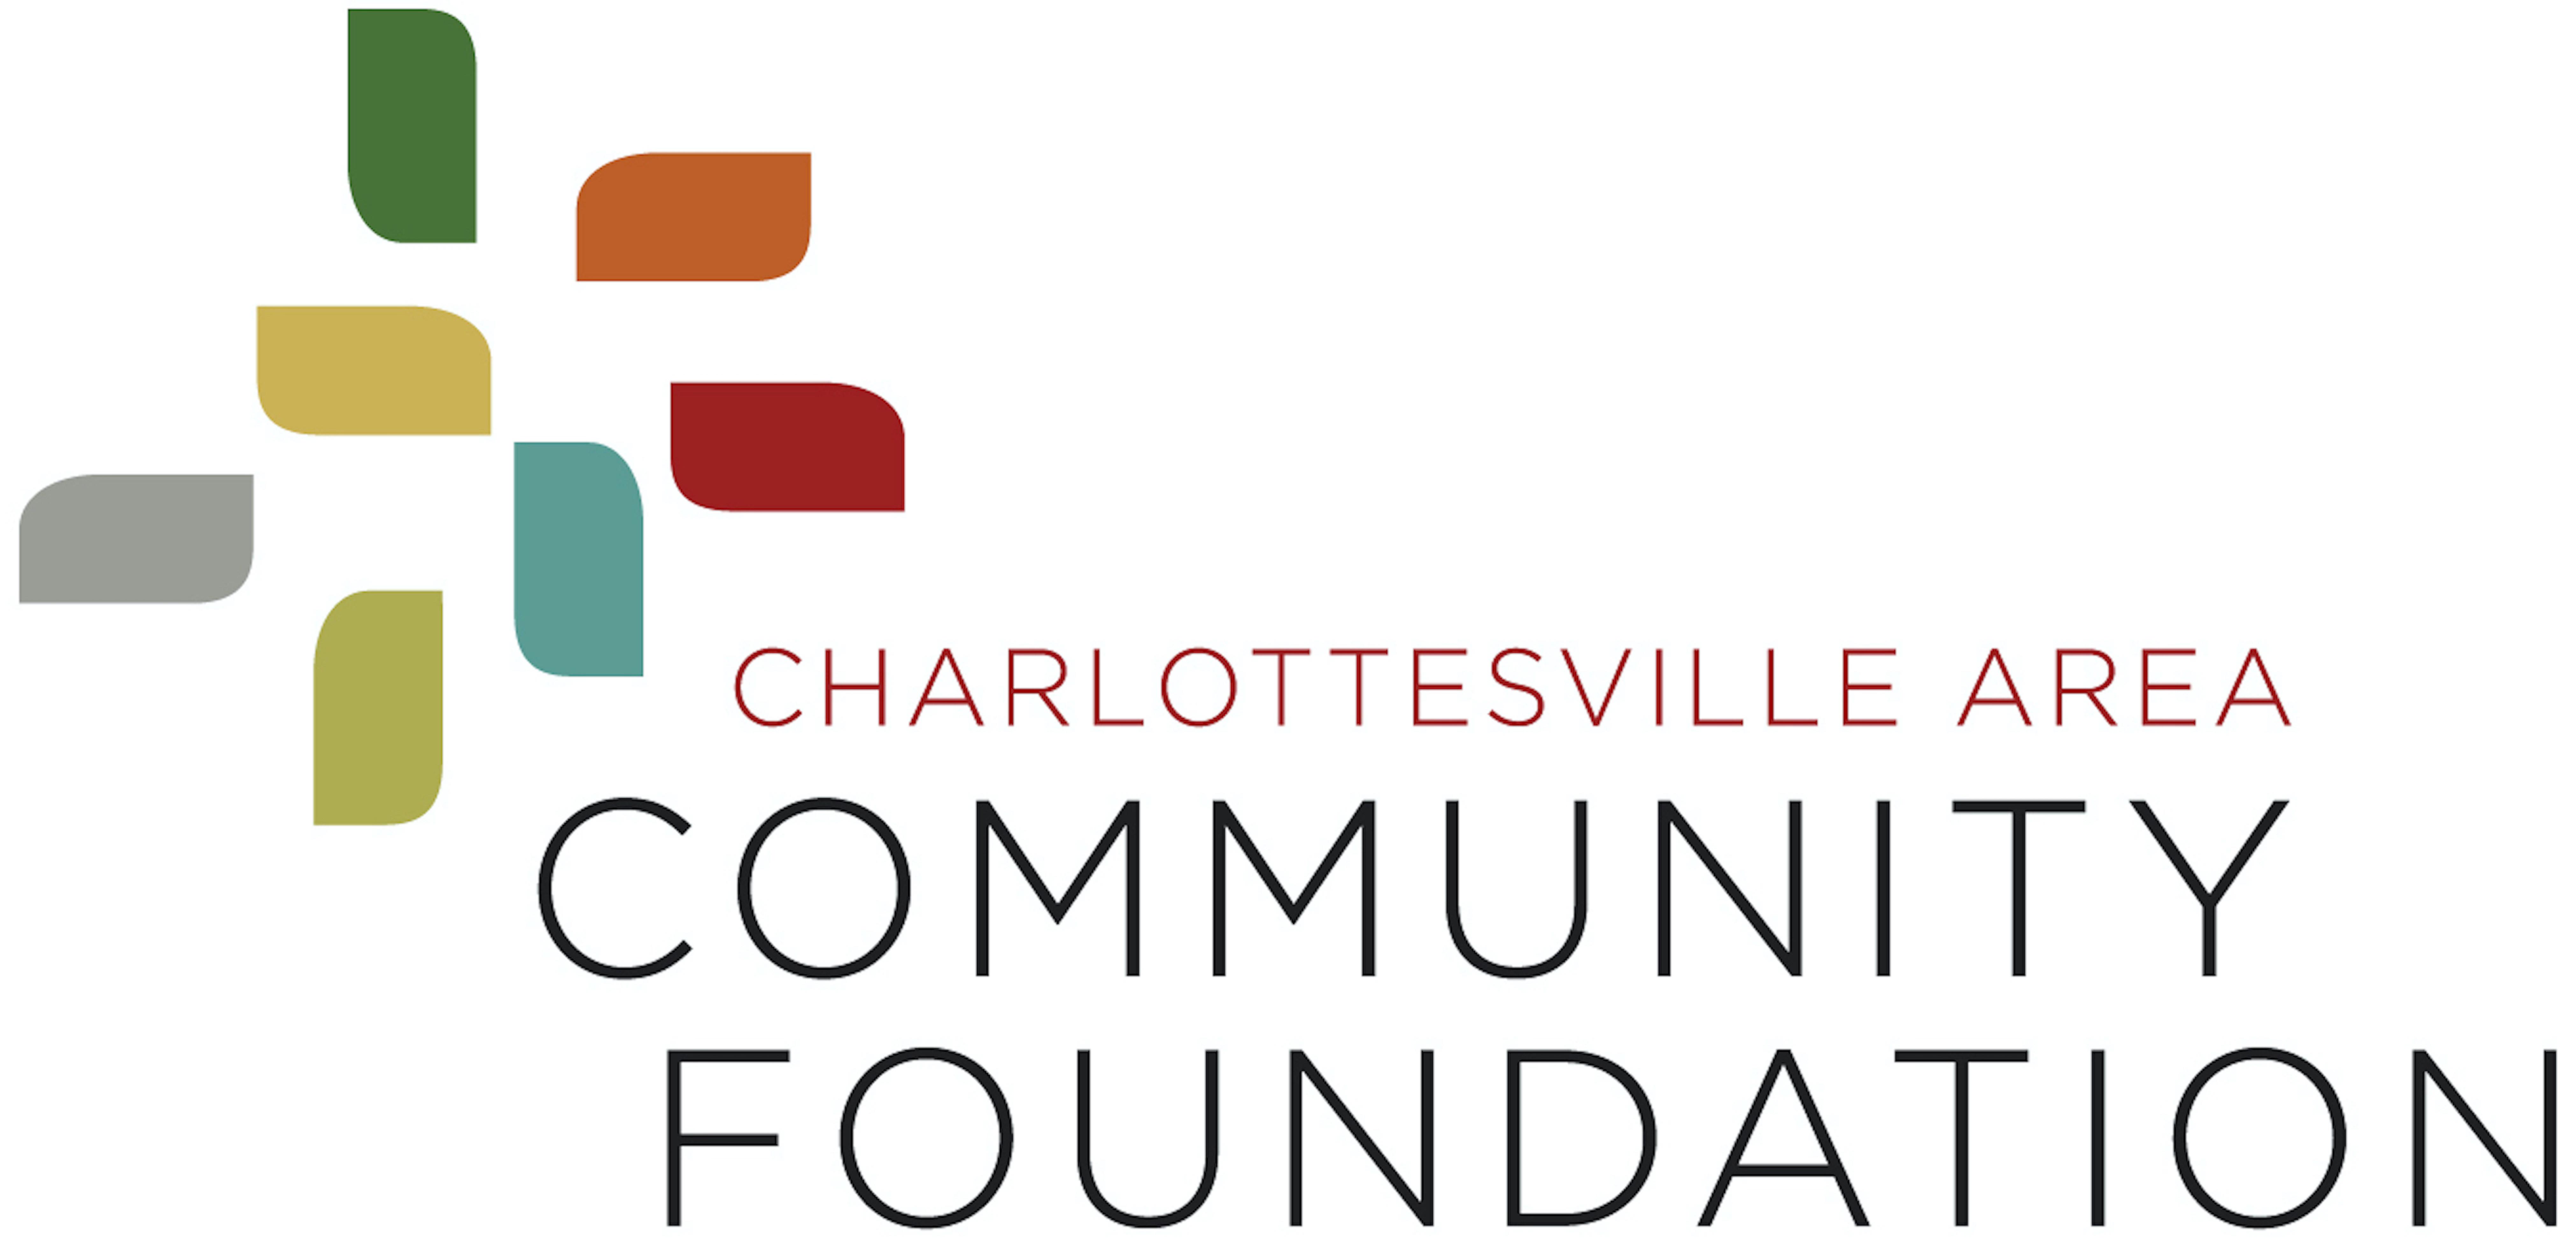 Charlottesville Area Community Foundation